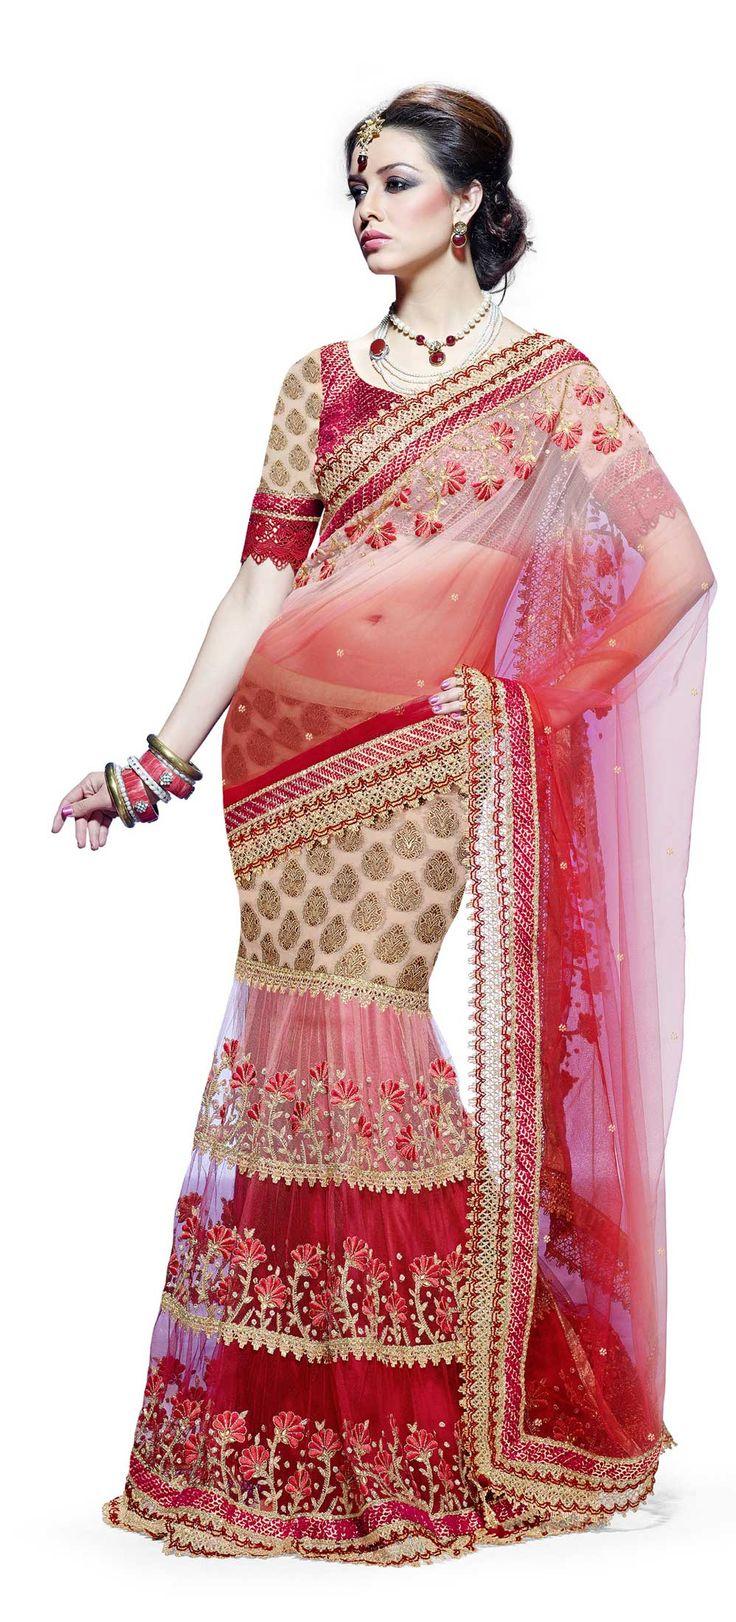 Mahotsav One Minute Saree - (Red)